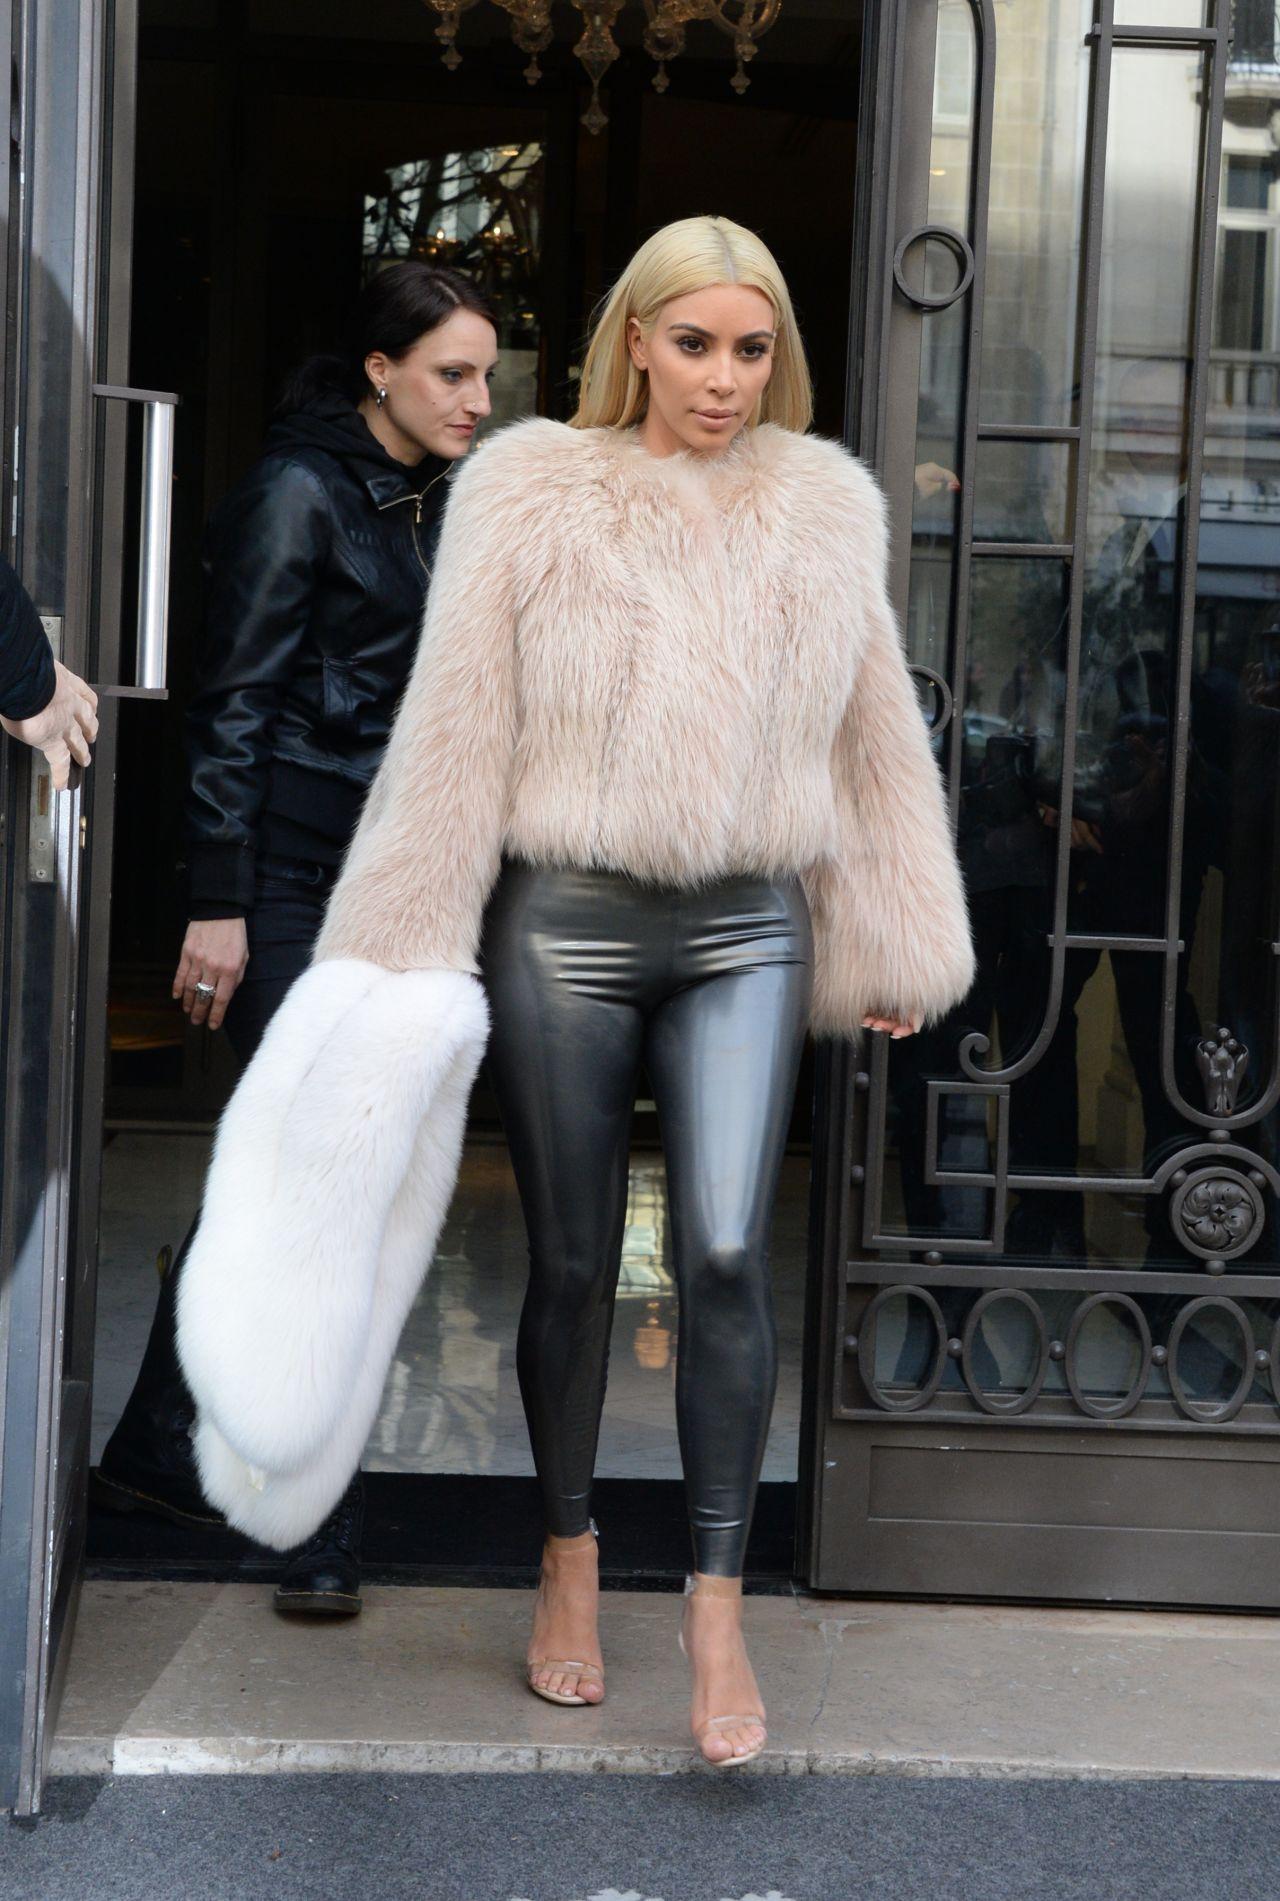 Kim Kardashian Dyed Her Hair Paris March 2015